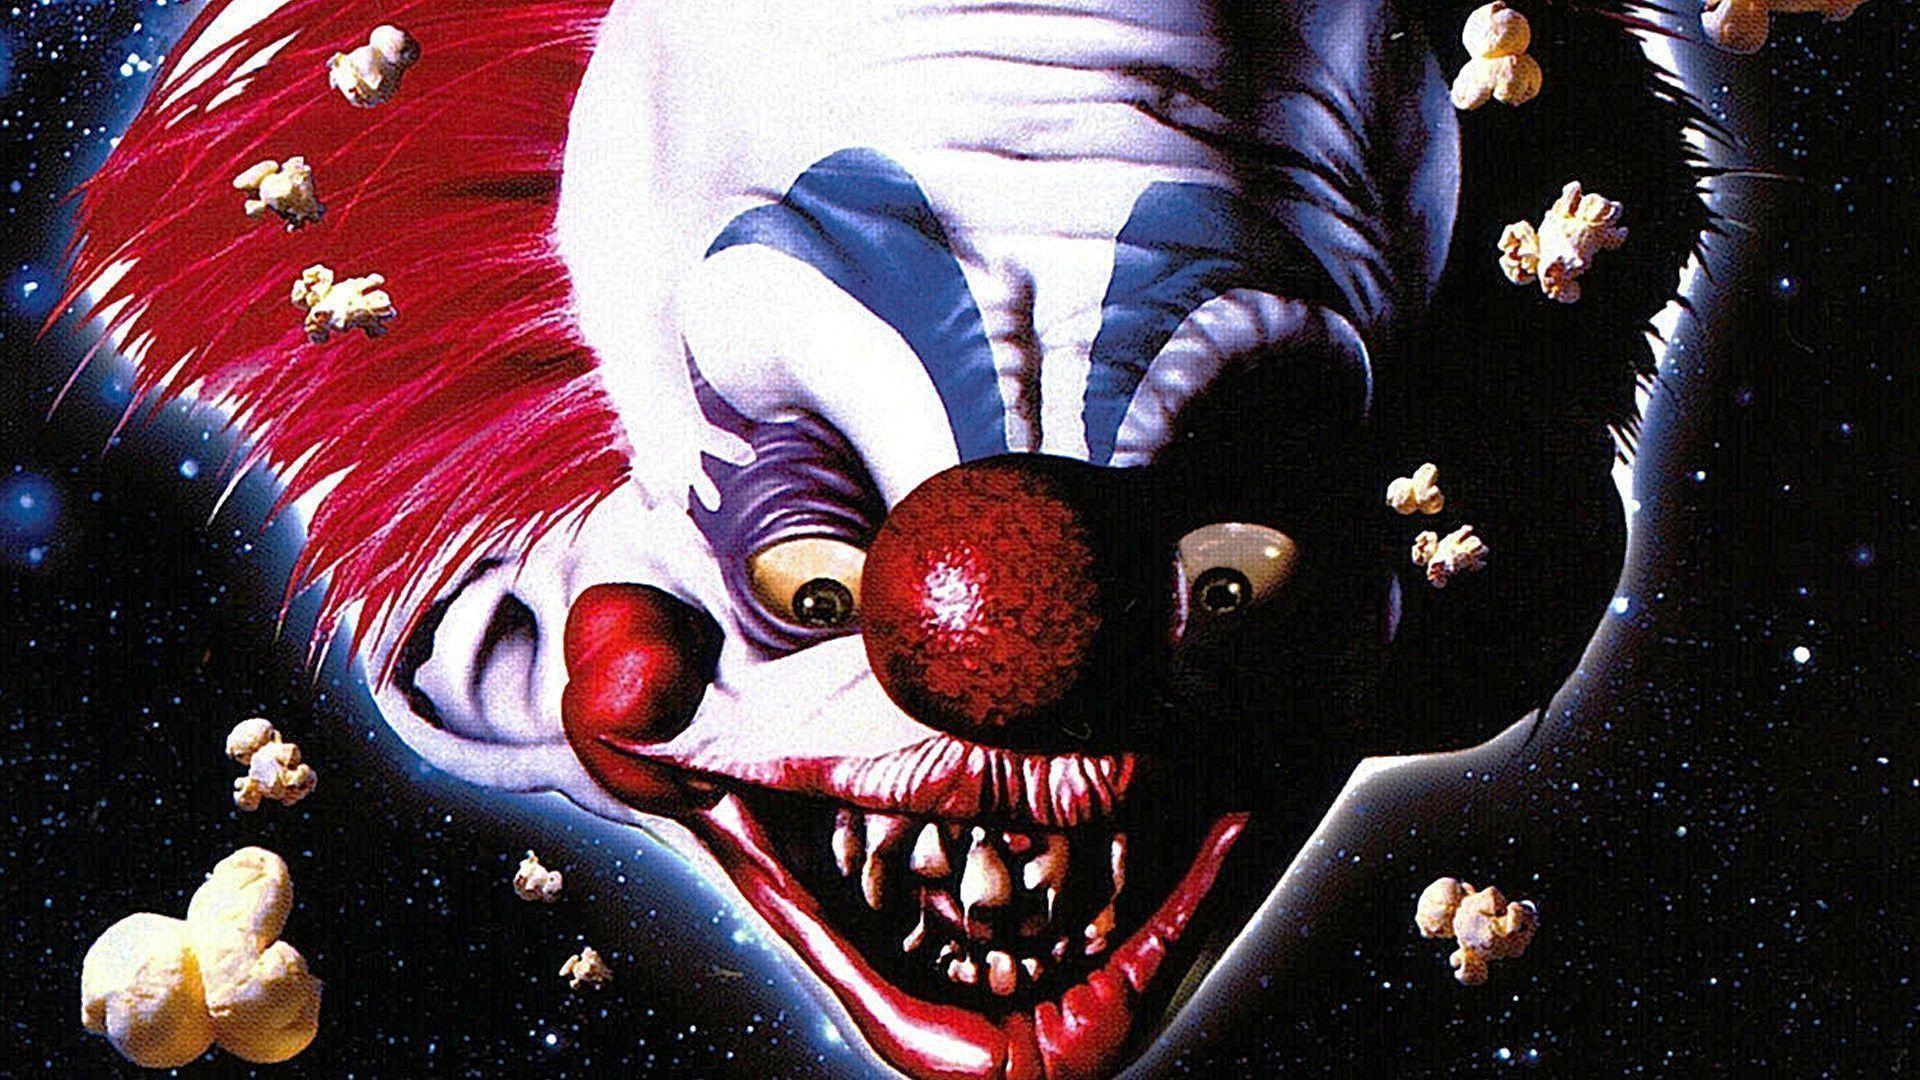 Wallpapers For > Killer Clown Wallpaper